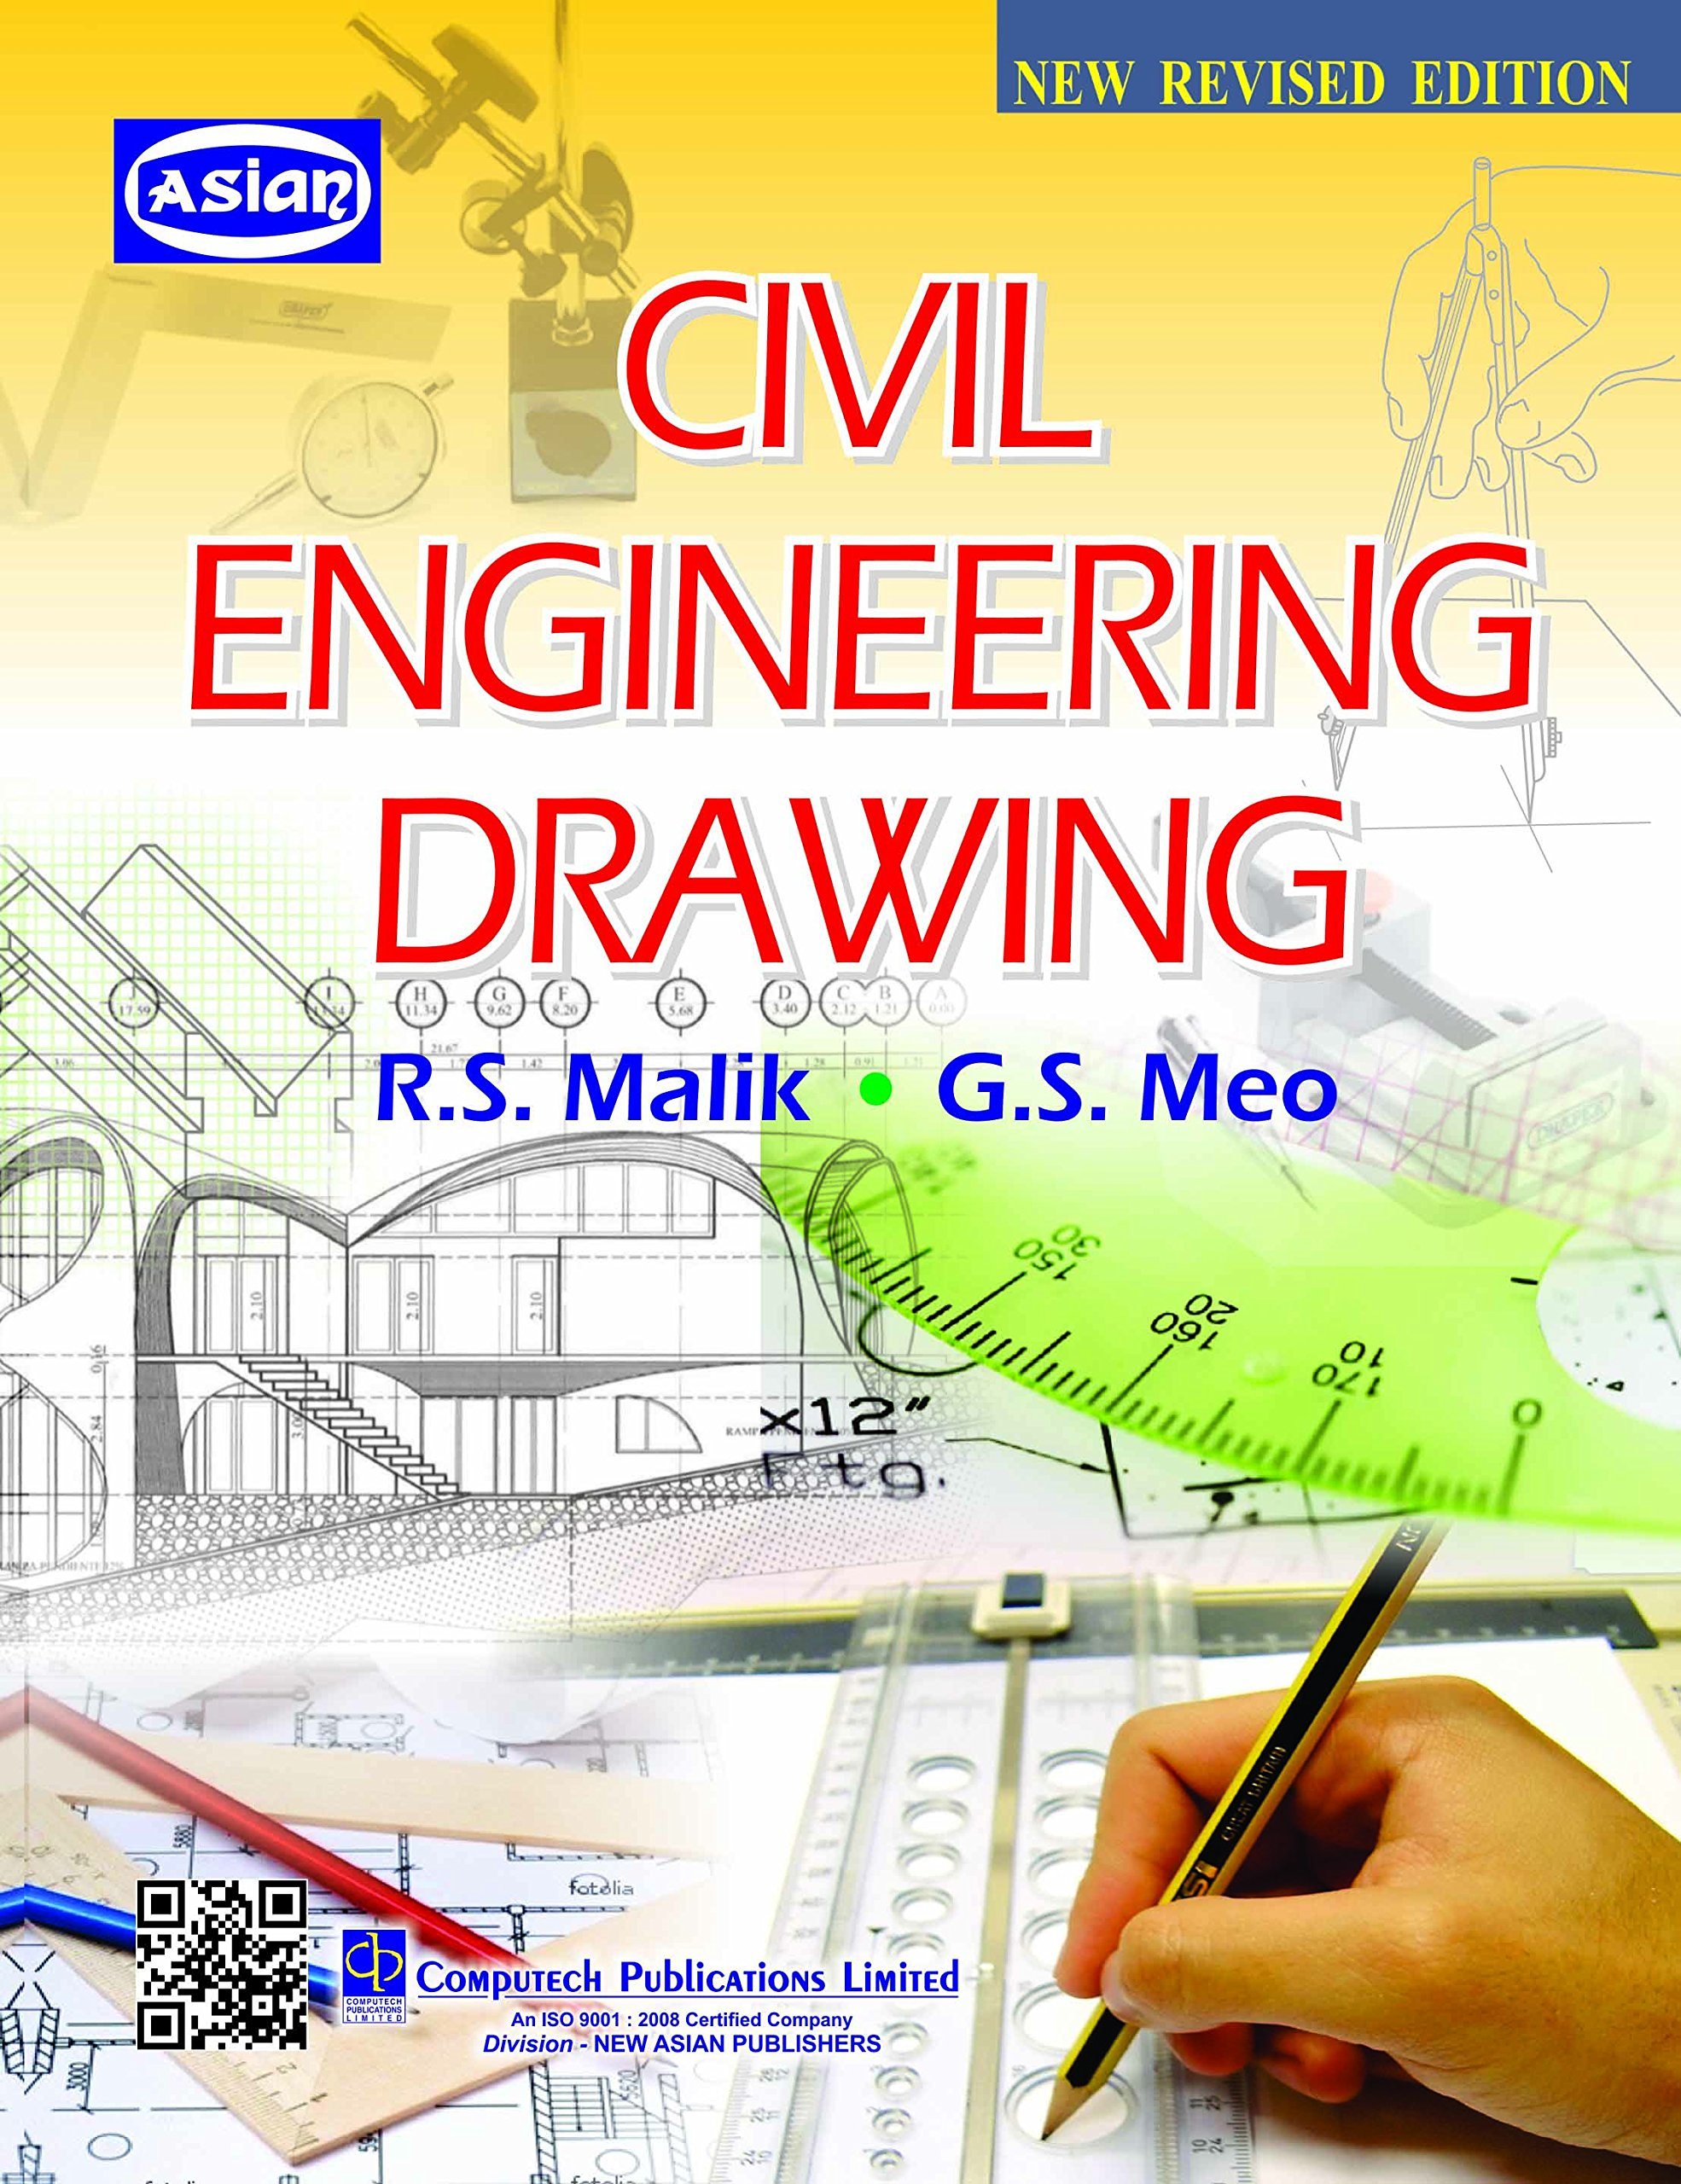 Civil engineering drawing in pdf - prowash's diary